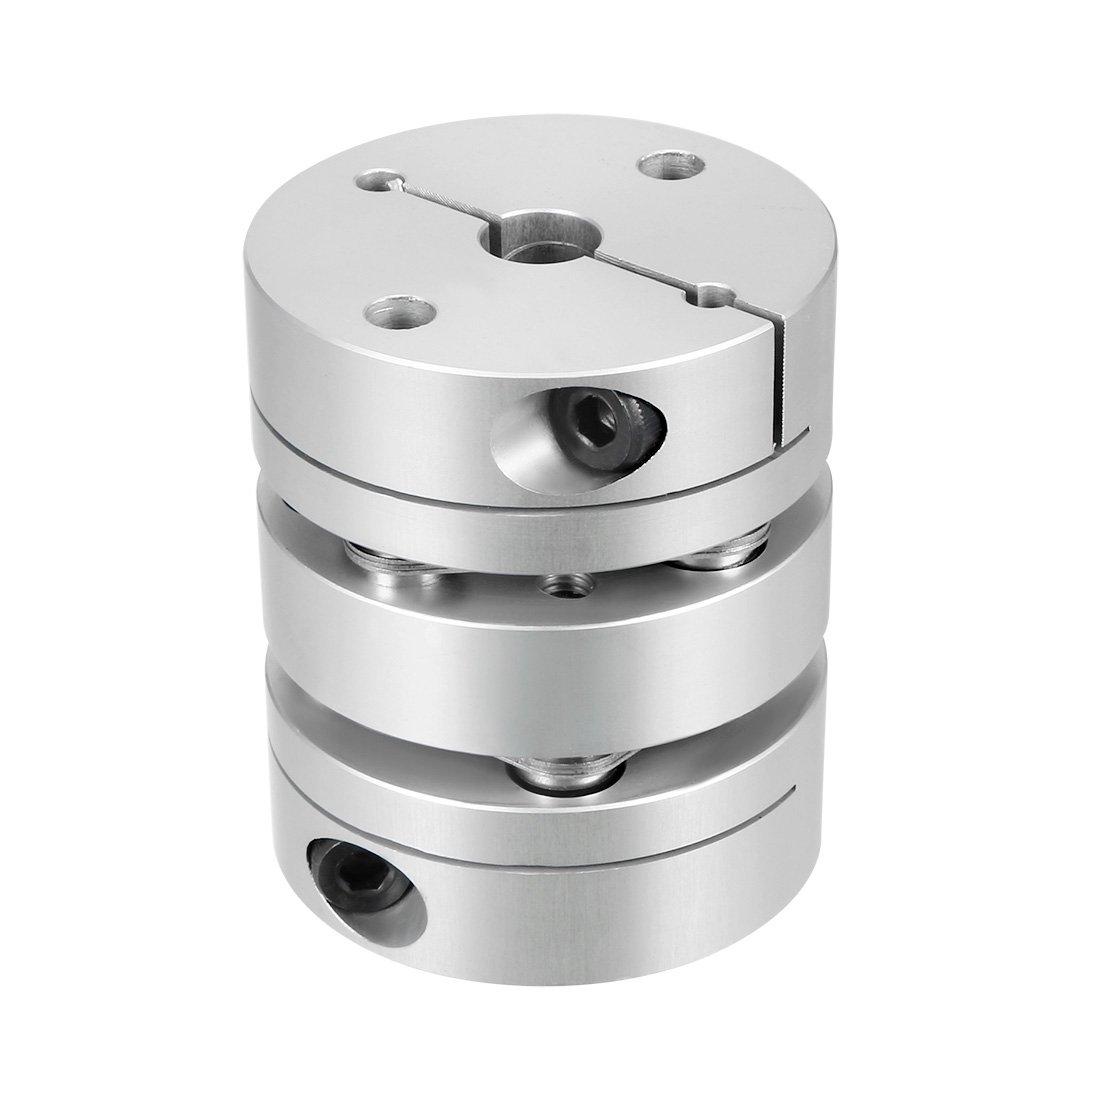 sourcingmap 14mmx16mm Clamp Tight Motor Shaft 2 Diaphragm Coupling Coupler